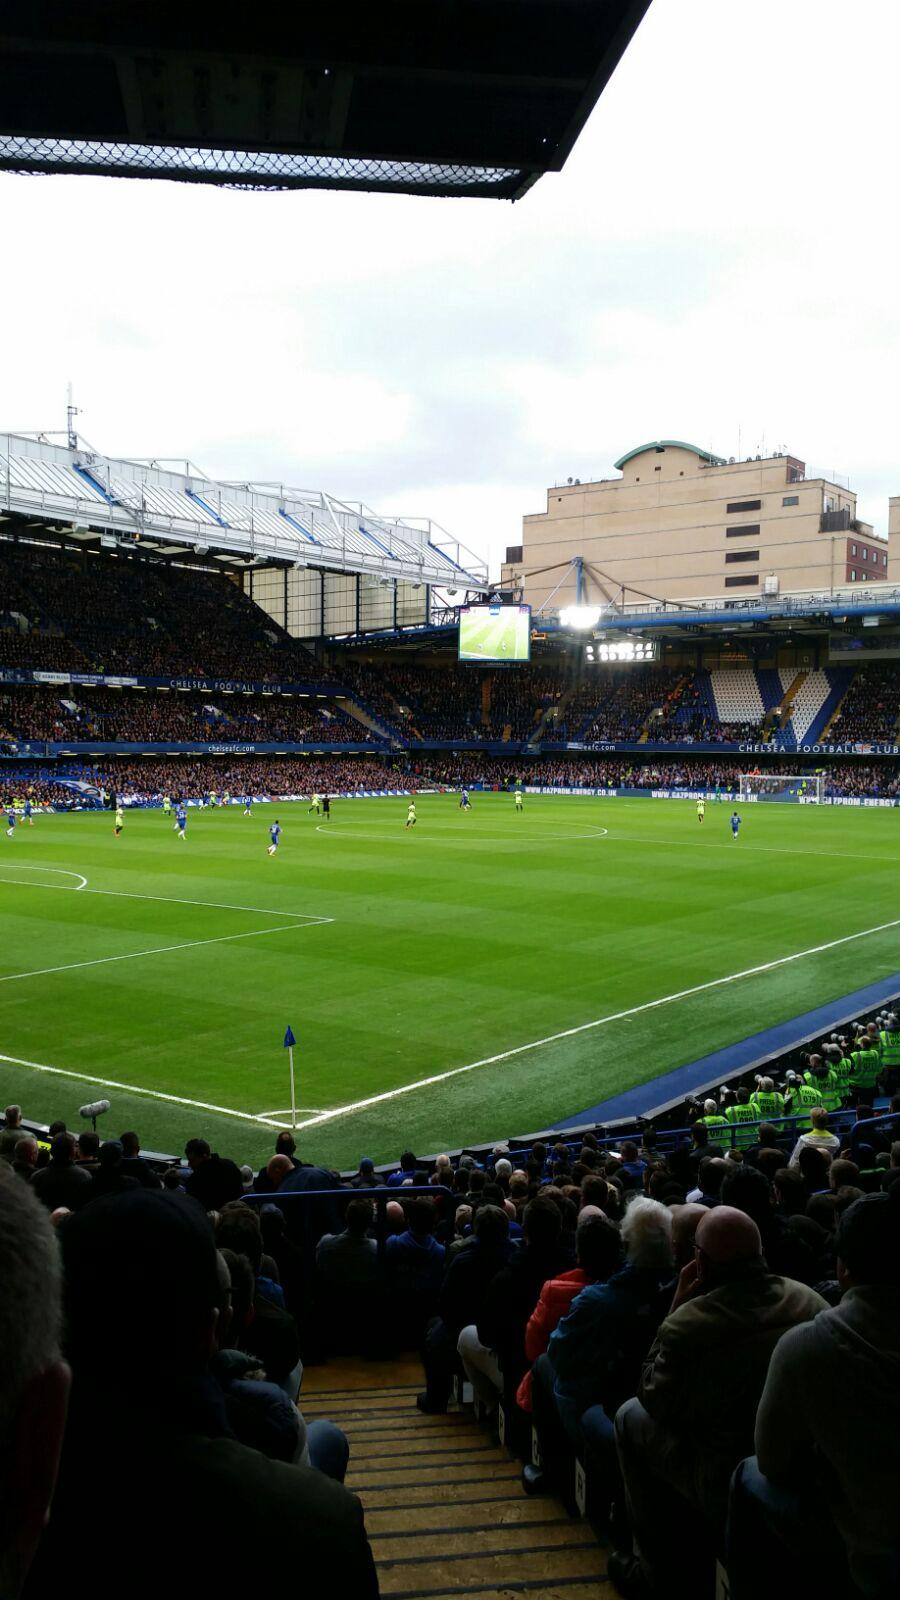 Stamford Bridge Sección Matthew Harding Lower 8 Fila U Asiento 395